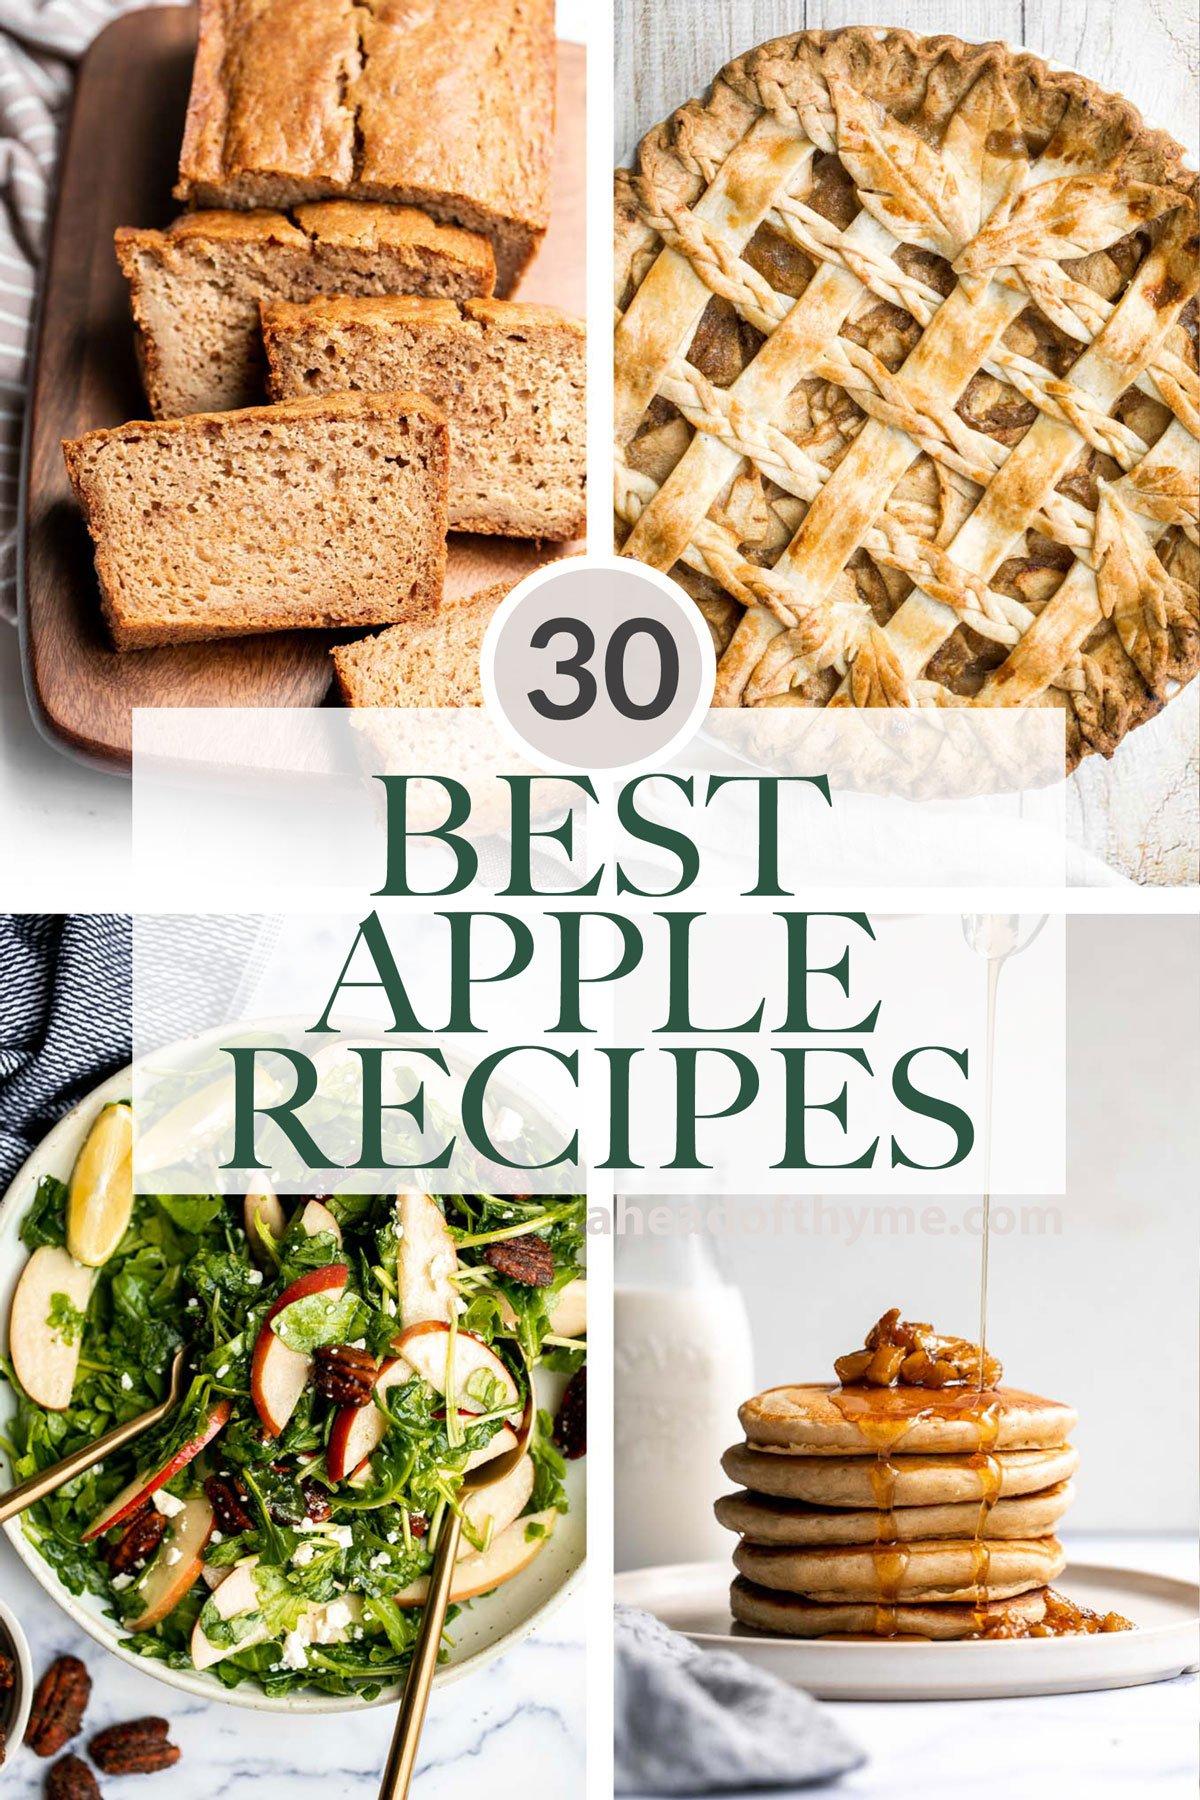 30 Best Apple Recipes